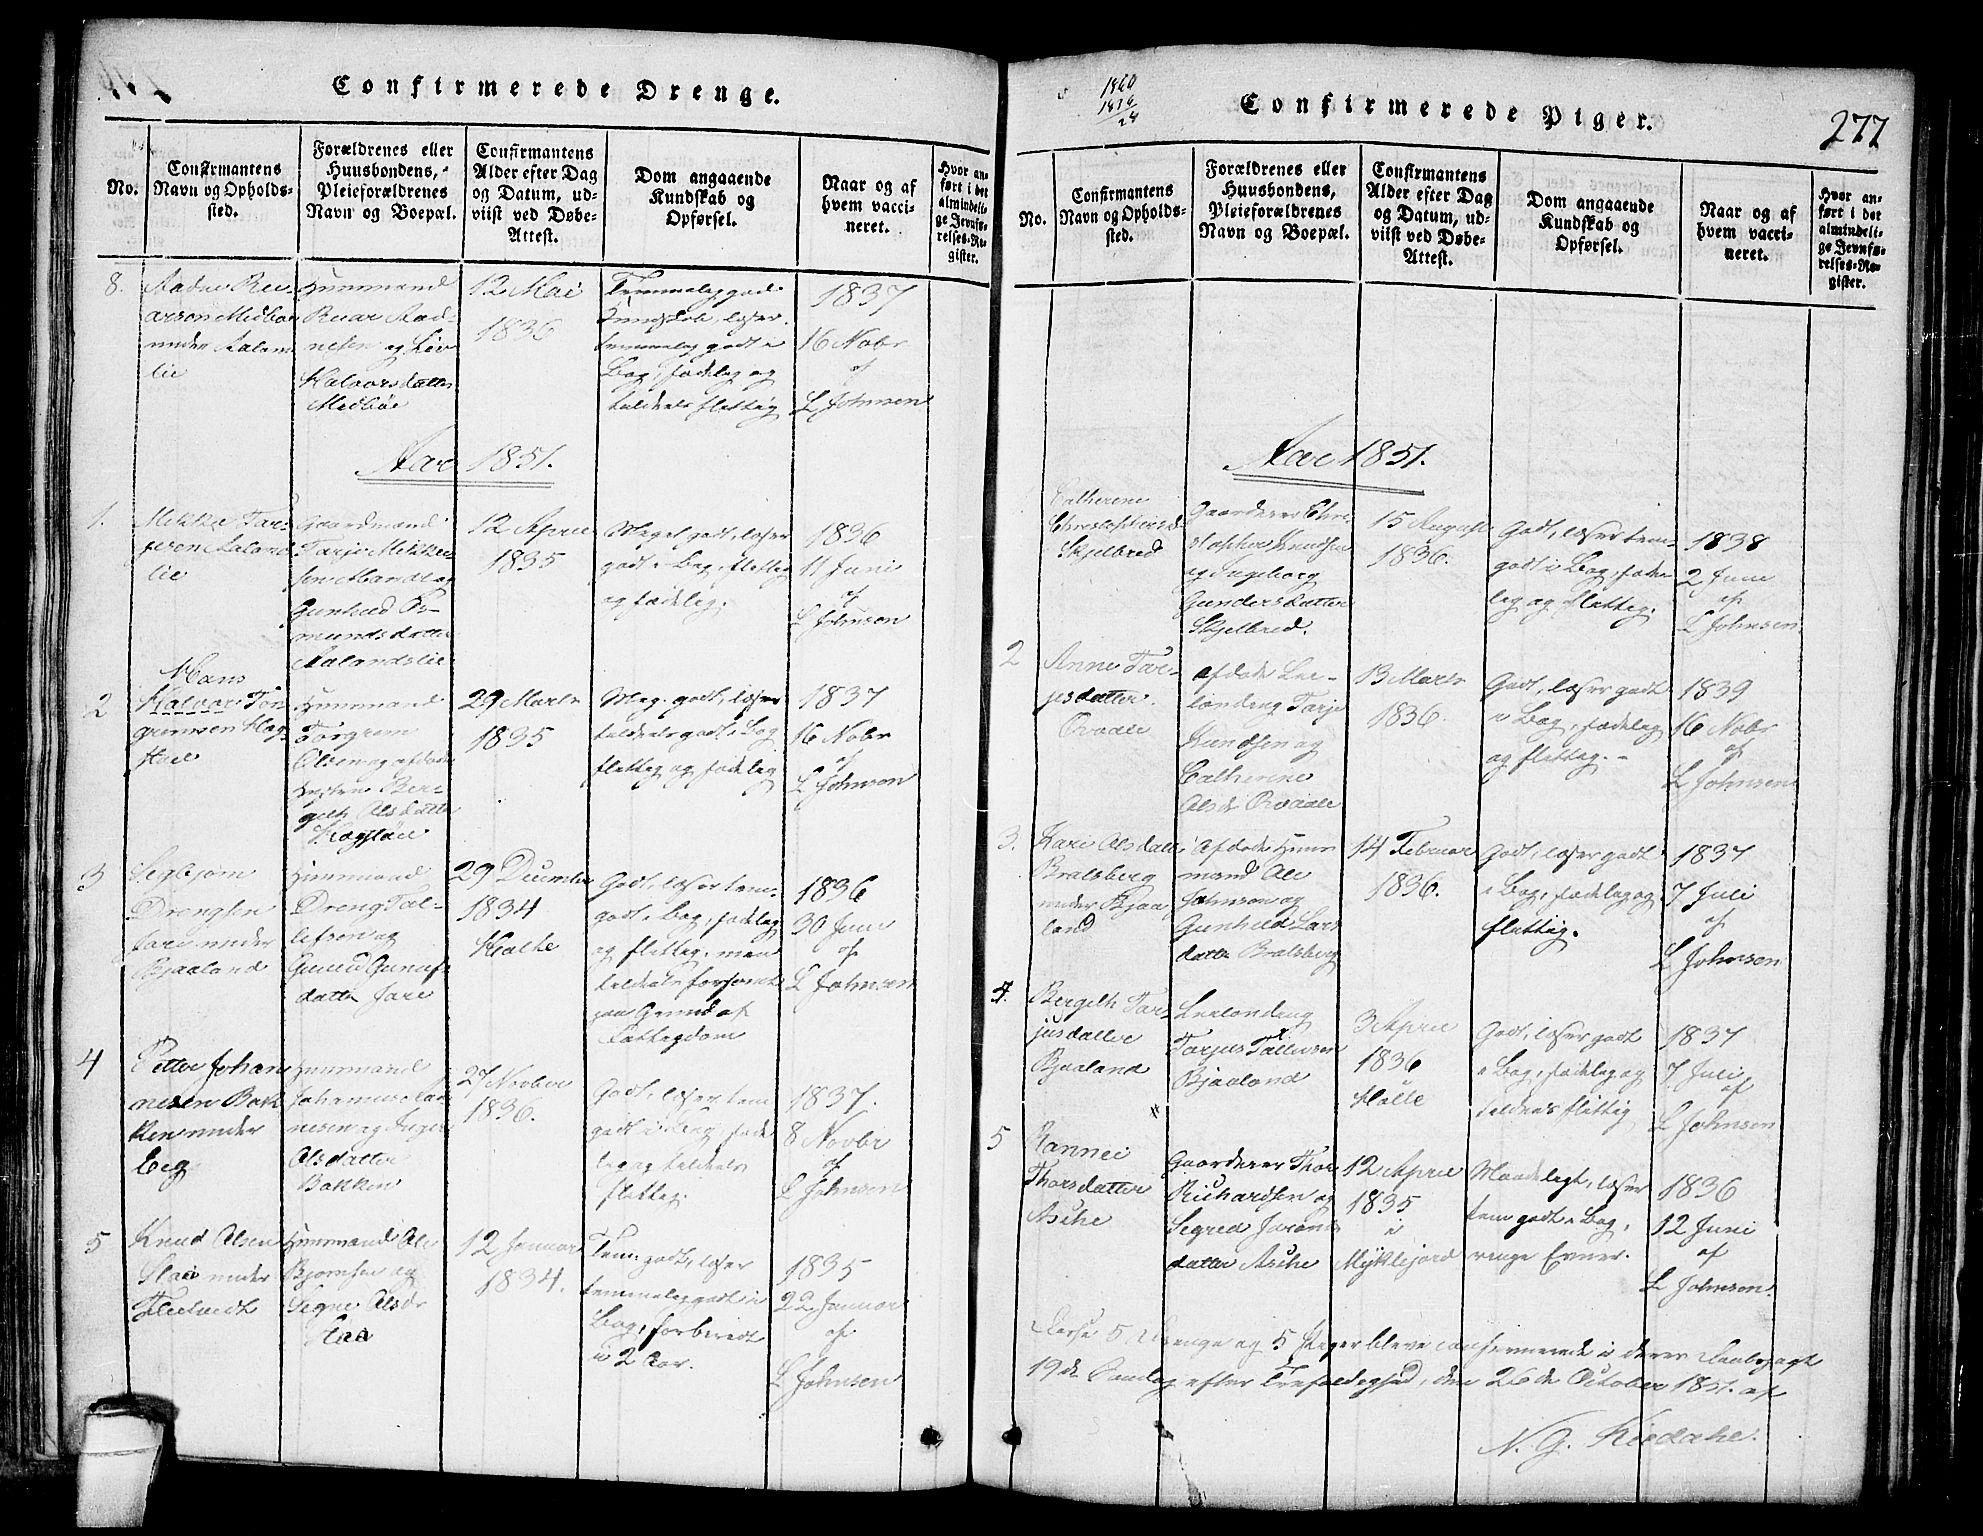 SAKO, Lårdal kirkebøker, G/Ga/L0001: Klokkerbok nr. I 1, 1815-1861, s. 277